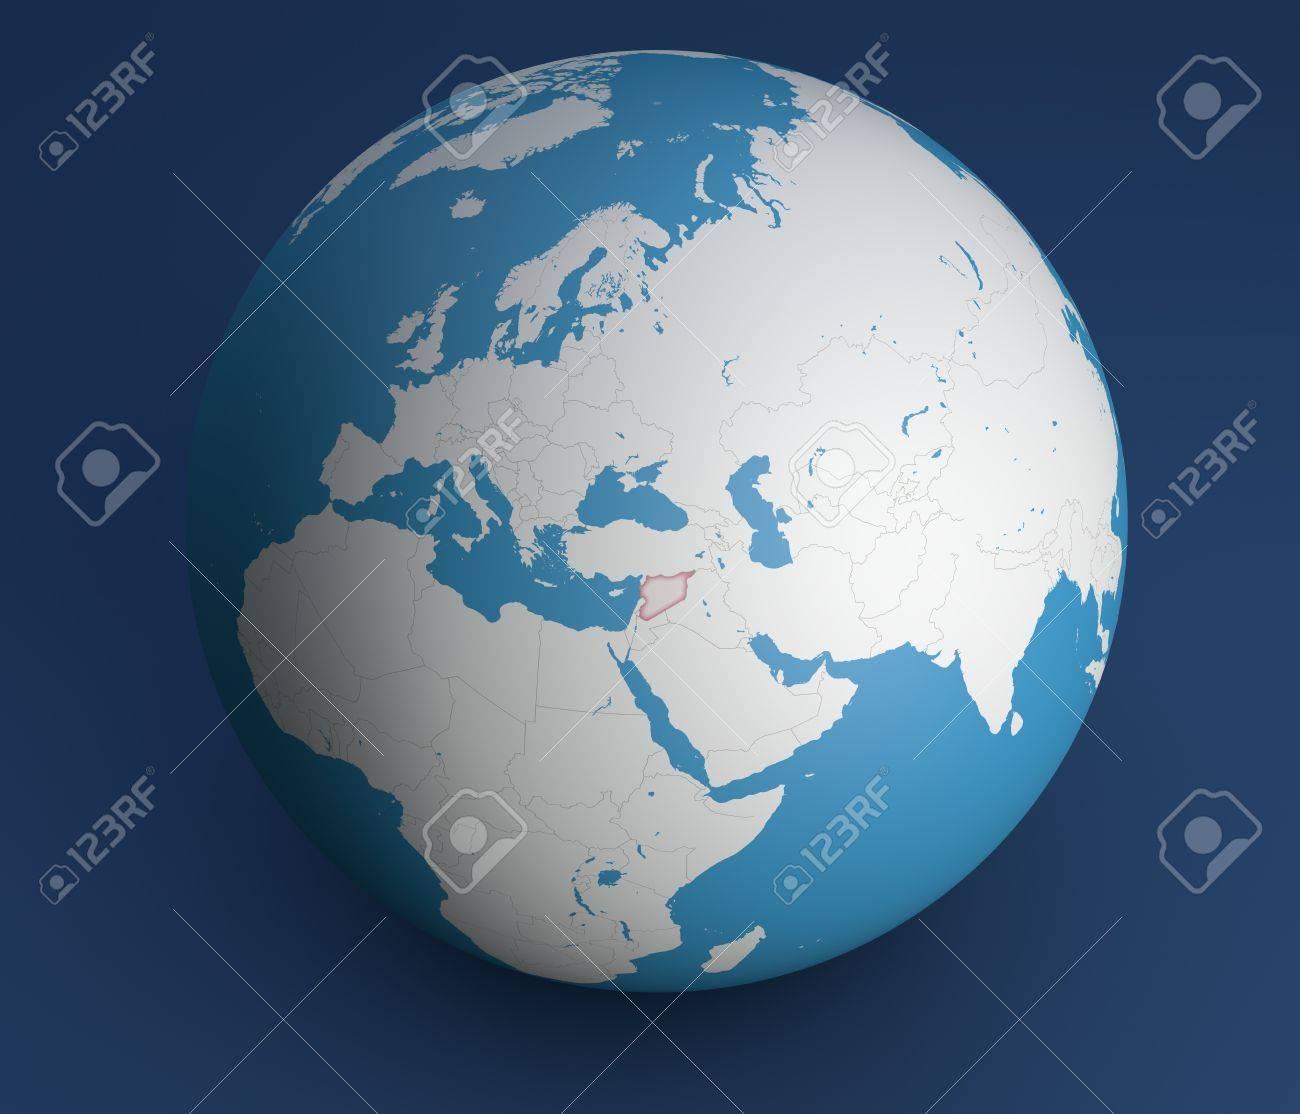 Planisphere map globe syria middle east europe africa and planisphere map globe syria middle east europe africa and asia stock photo gumiabroncs Choice Image